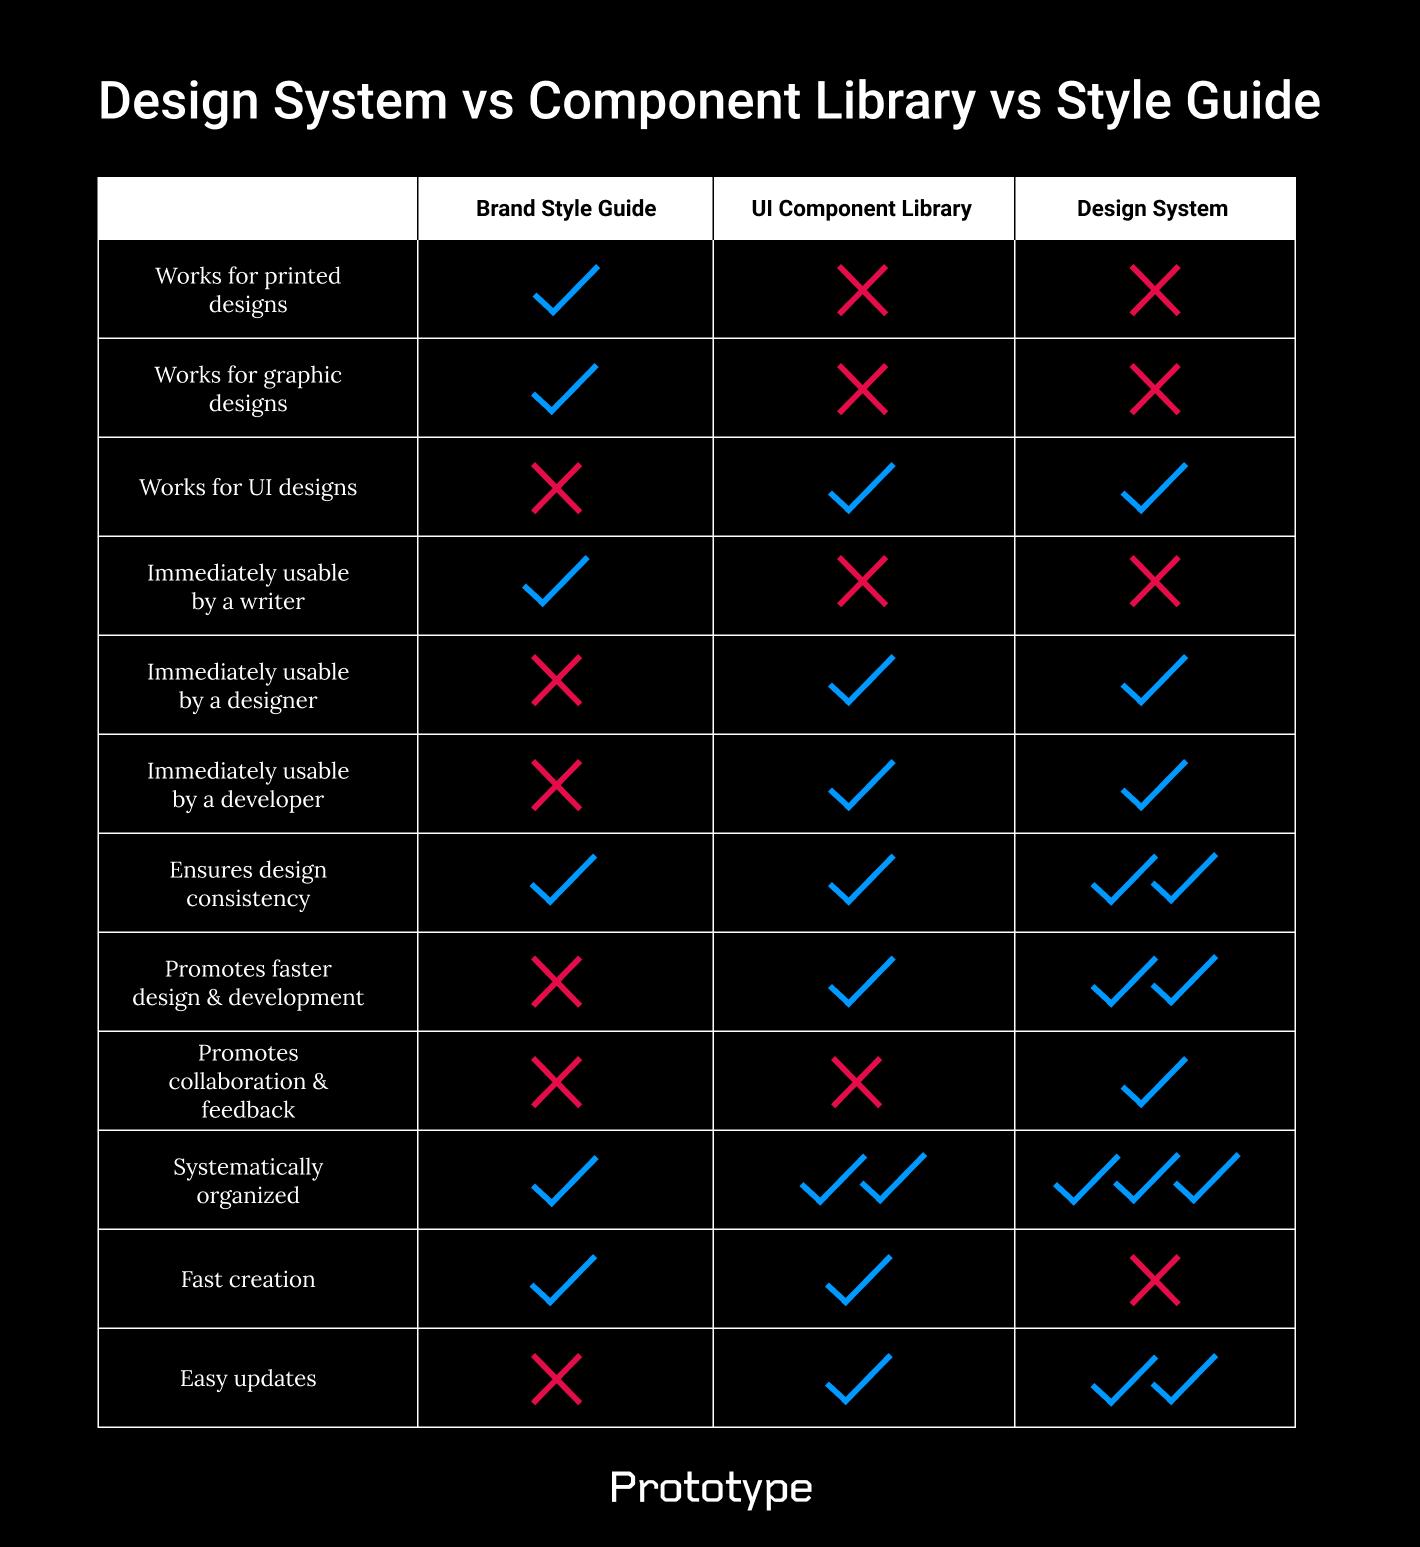 Design System vs Component Library vs Style Guide comparison table